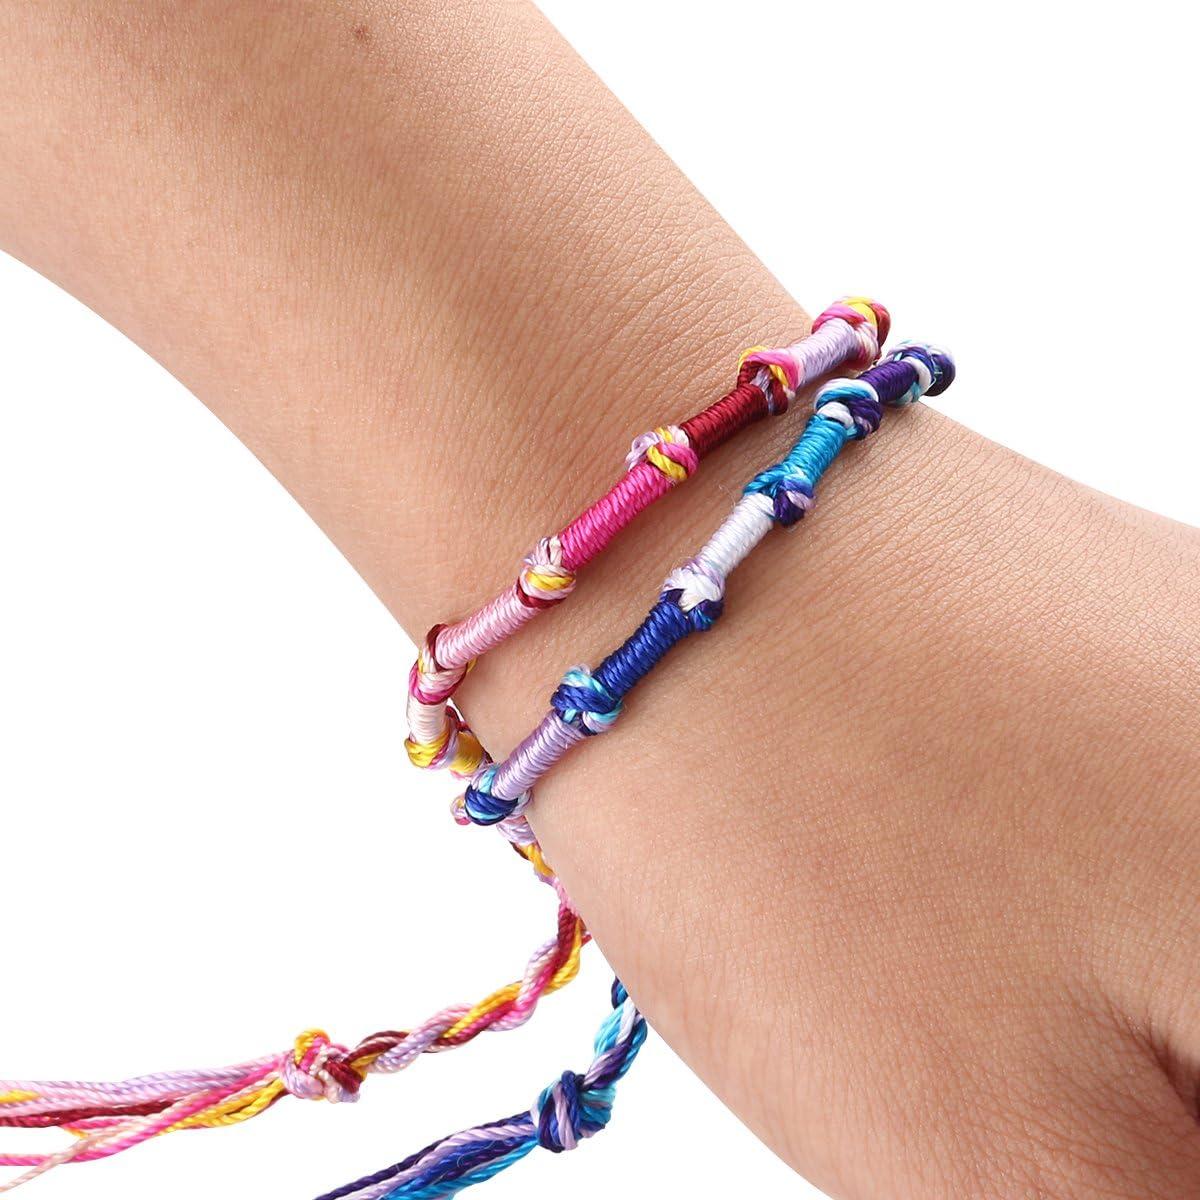 Random Color Toyvian Braided Bracelet Hippie Style Colorful Knurled Braided Bracelets Handmade Thread Wrist Ankle Bracelets Between 8-9.5-9pcs